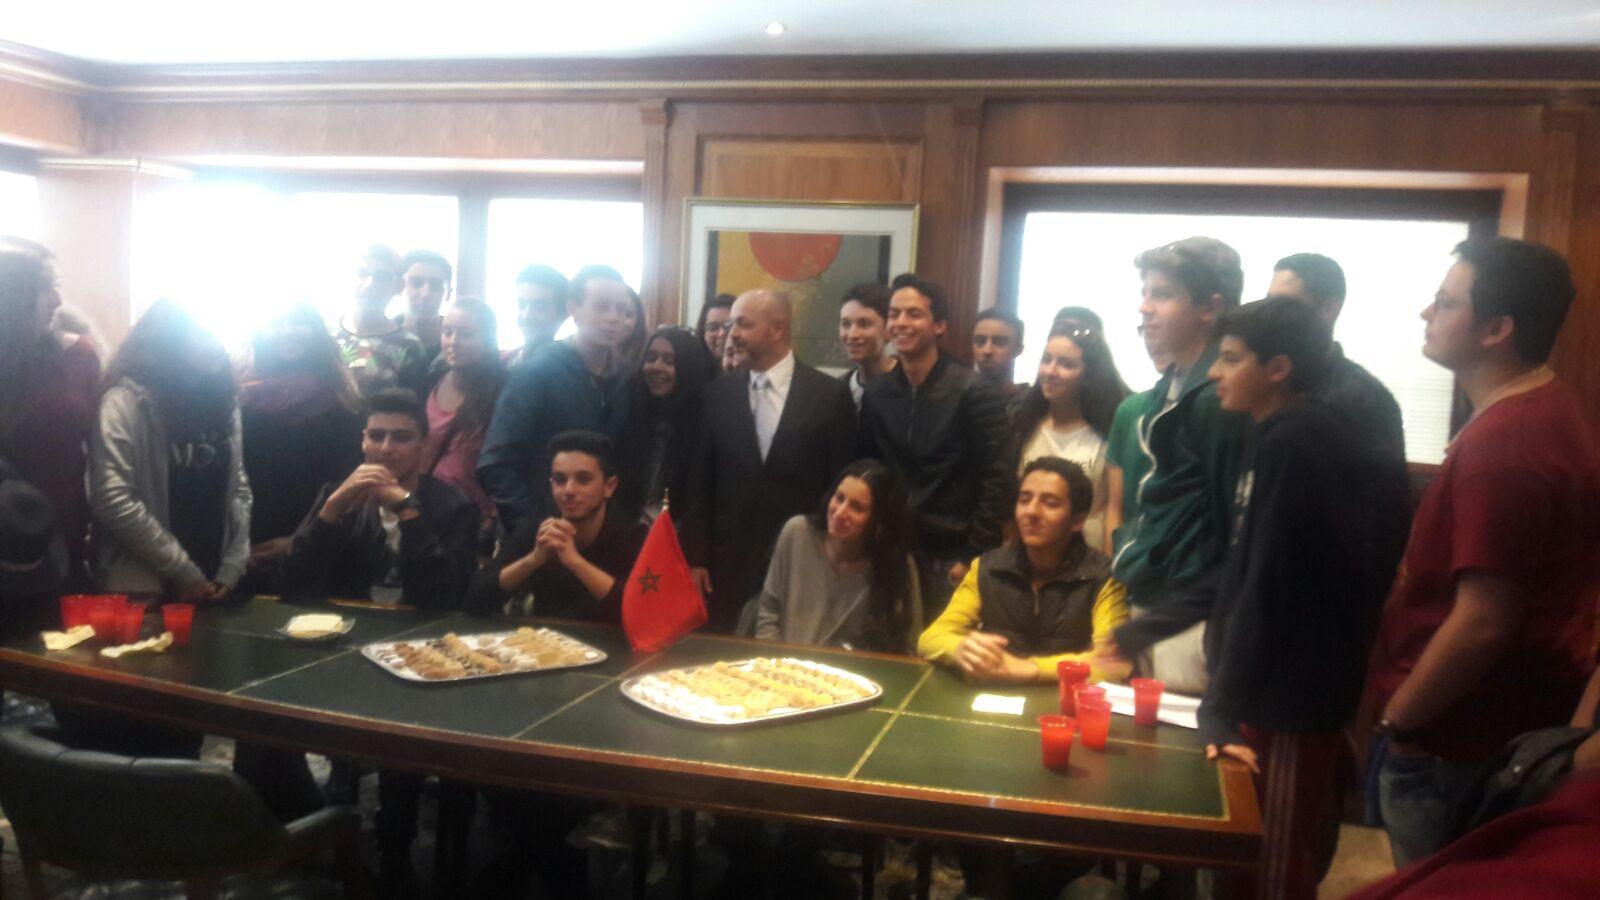 Visita-alumnos-del-liceo-Juan-Ramón-Jiménez